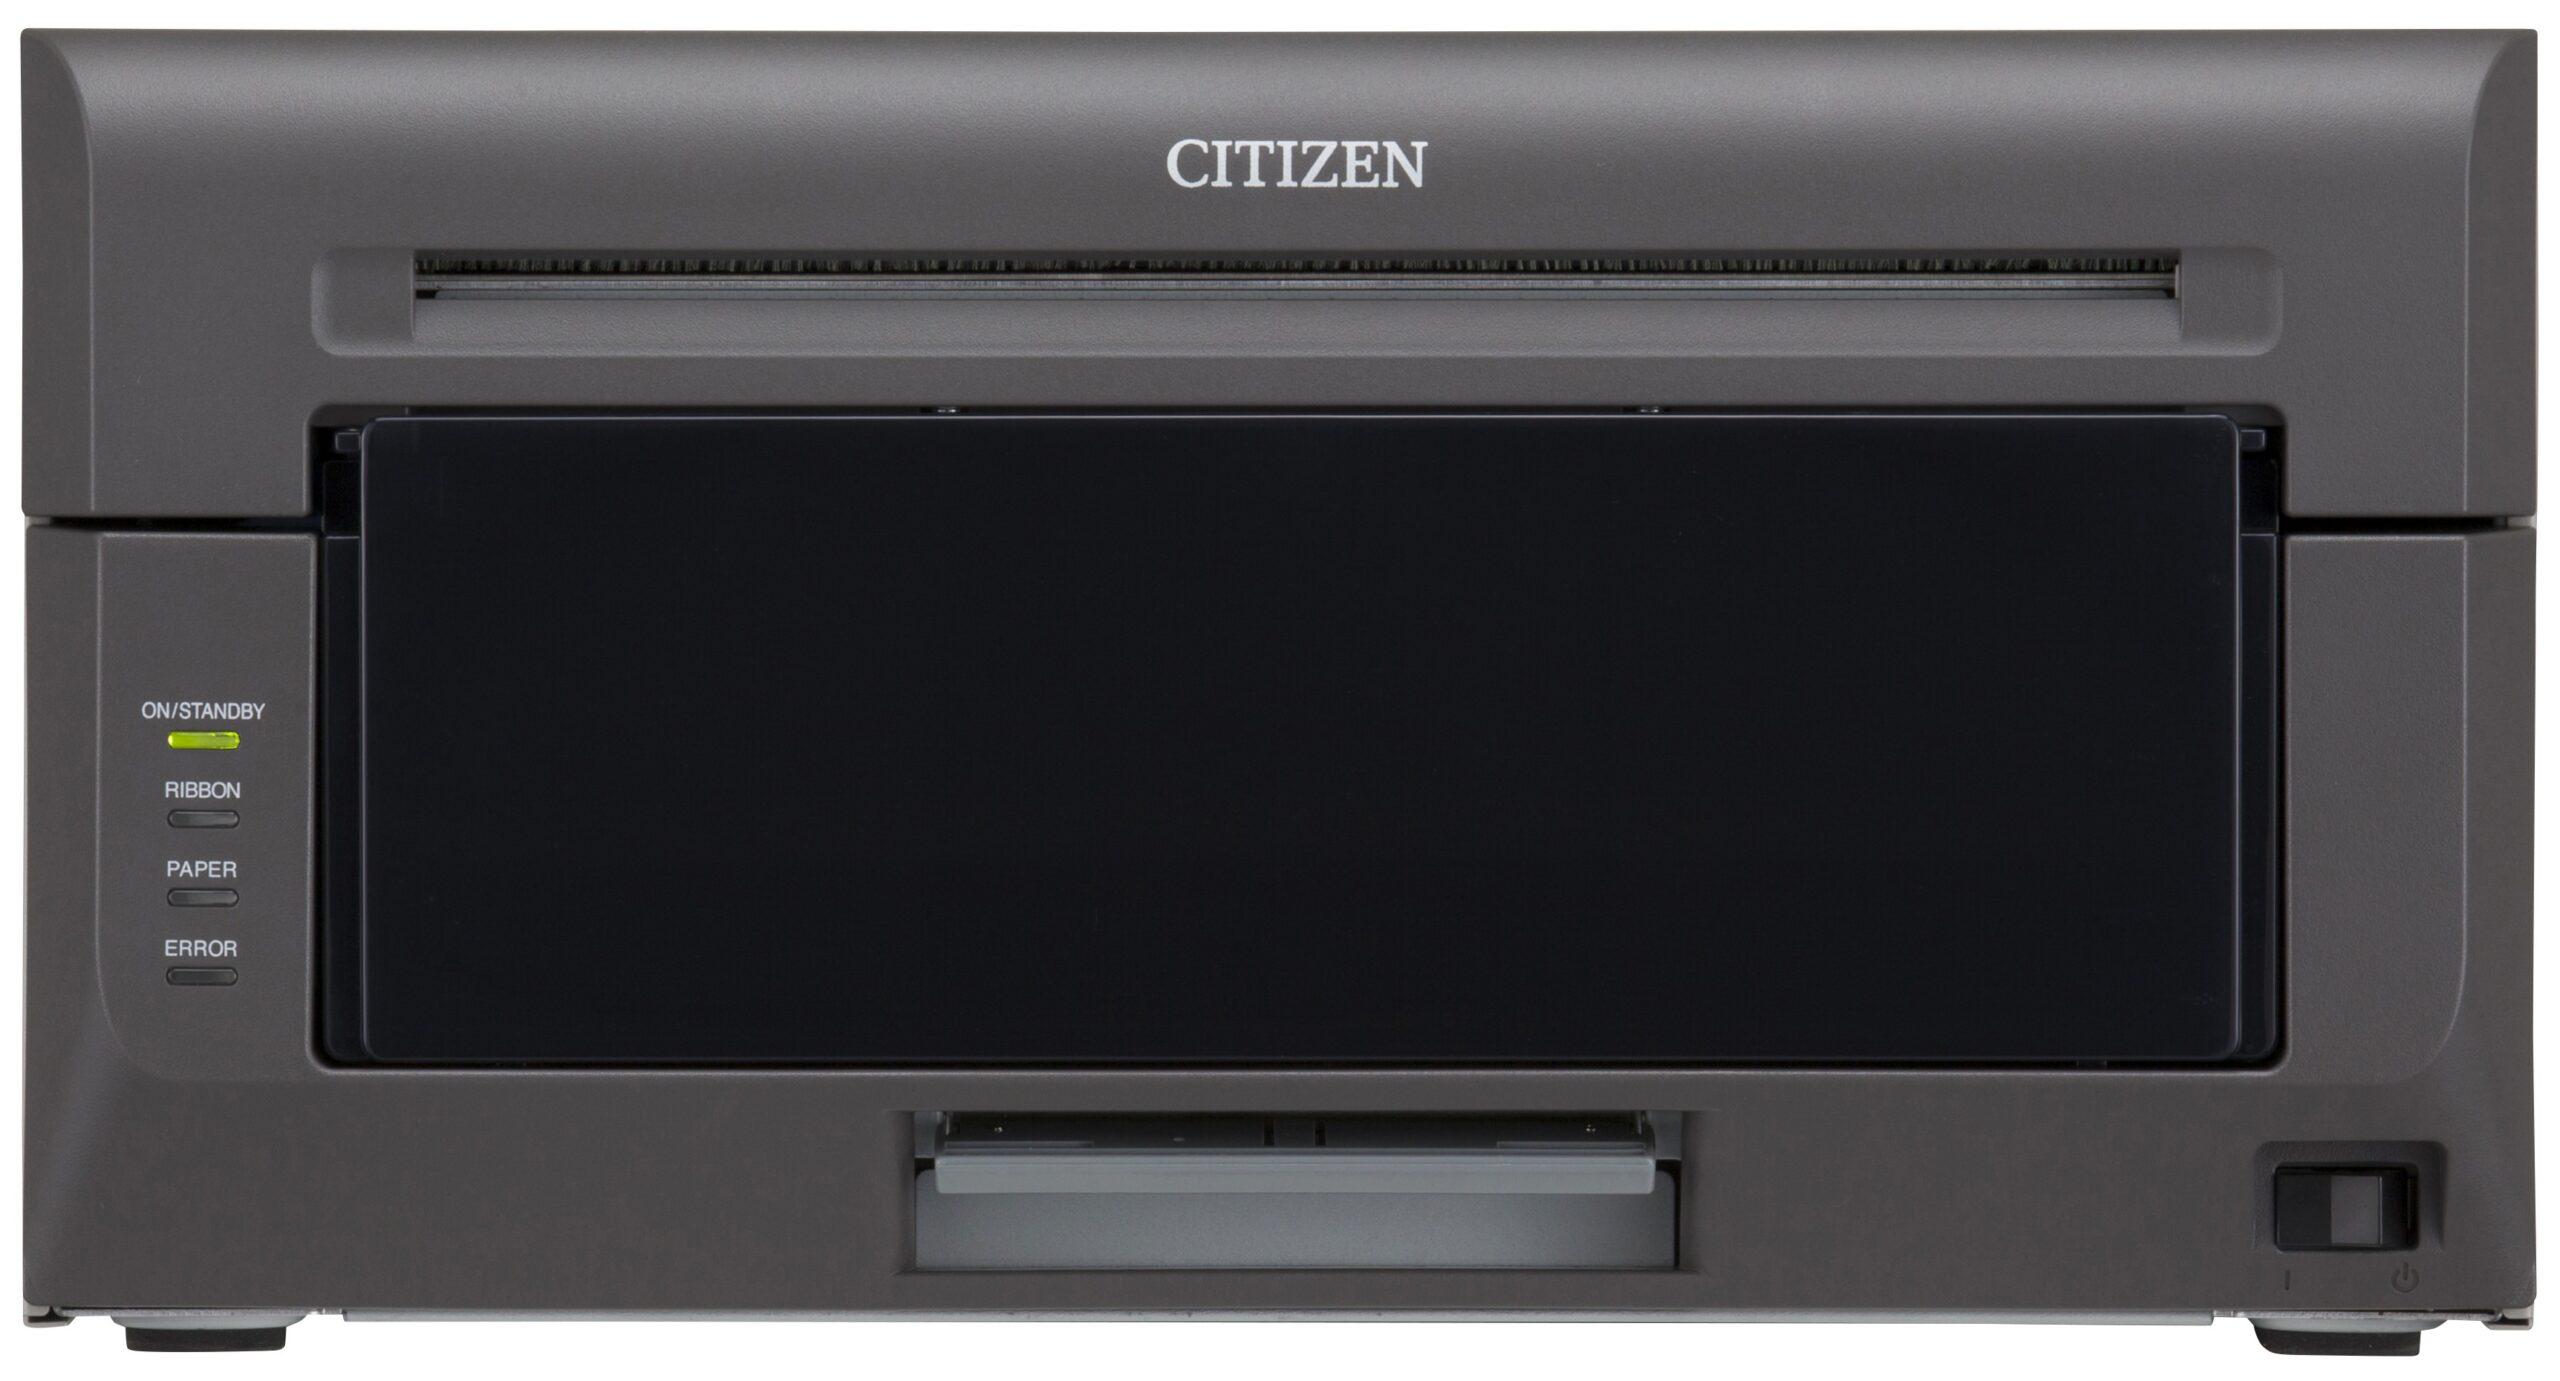 Citizen CX-02W Photo Printer Front